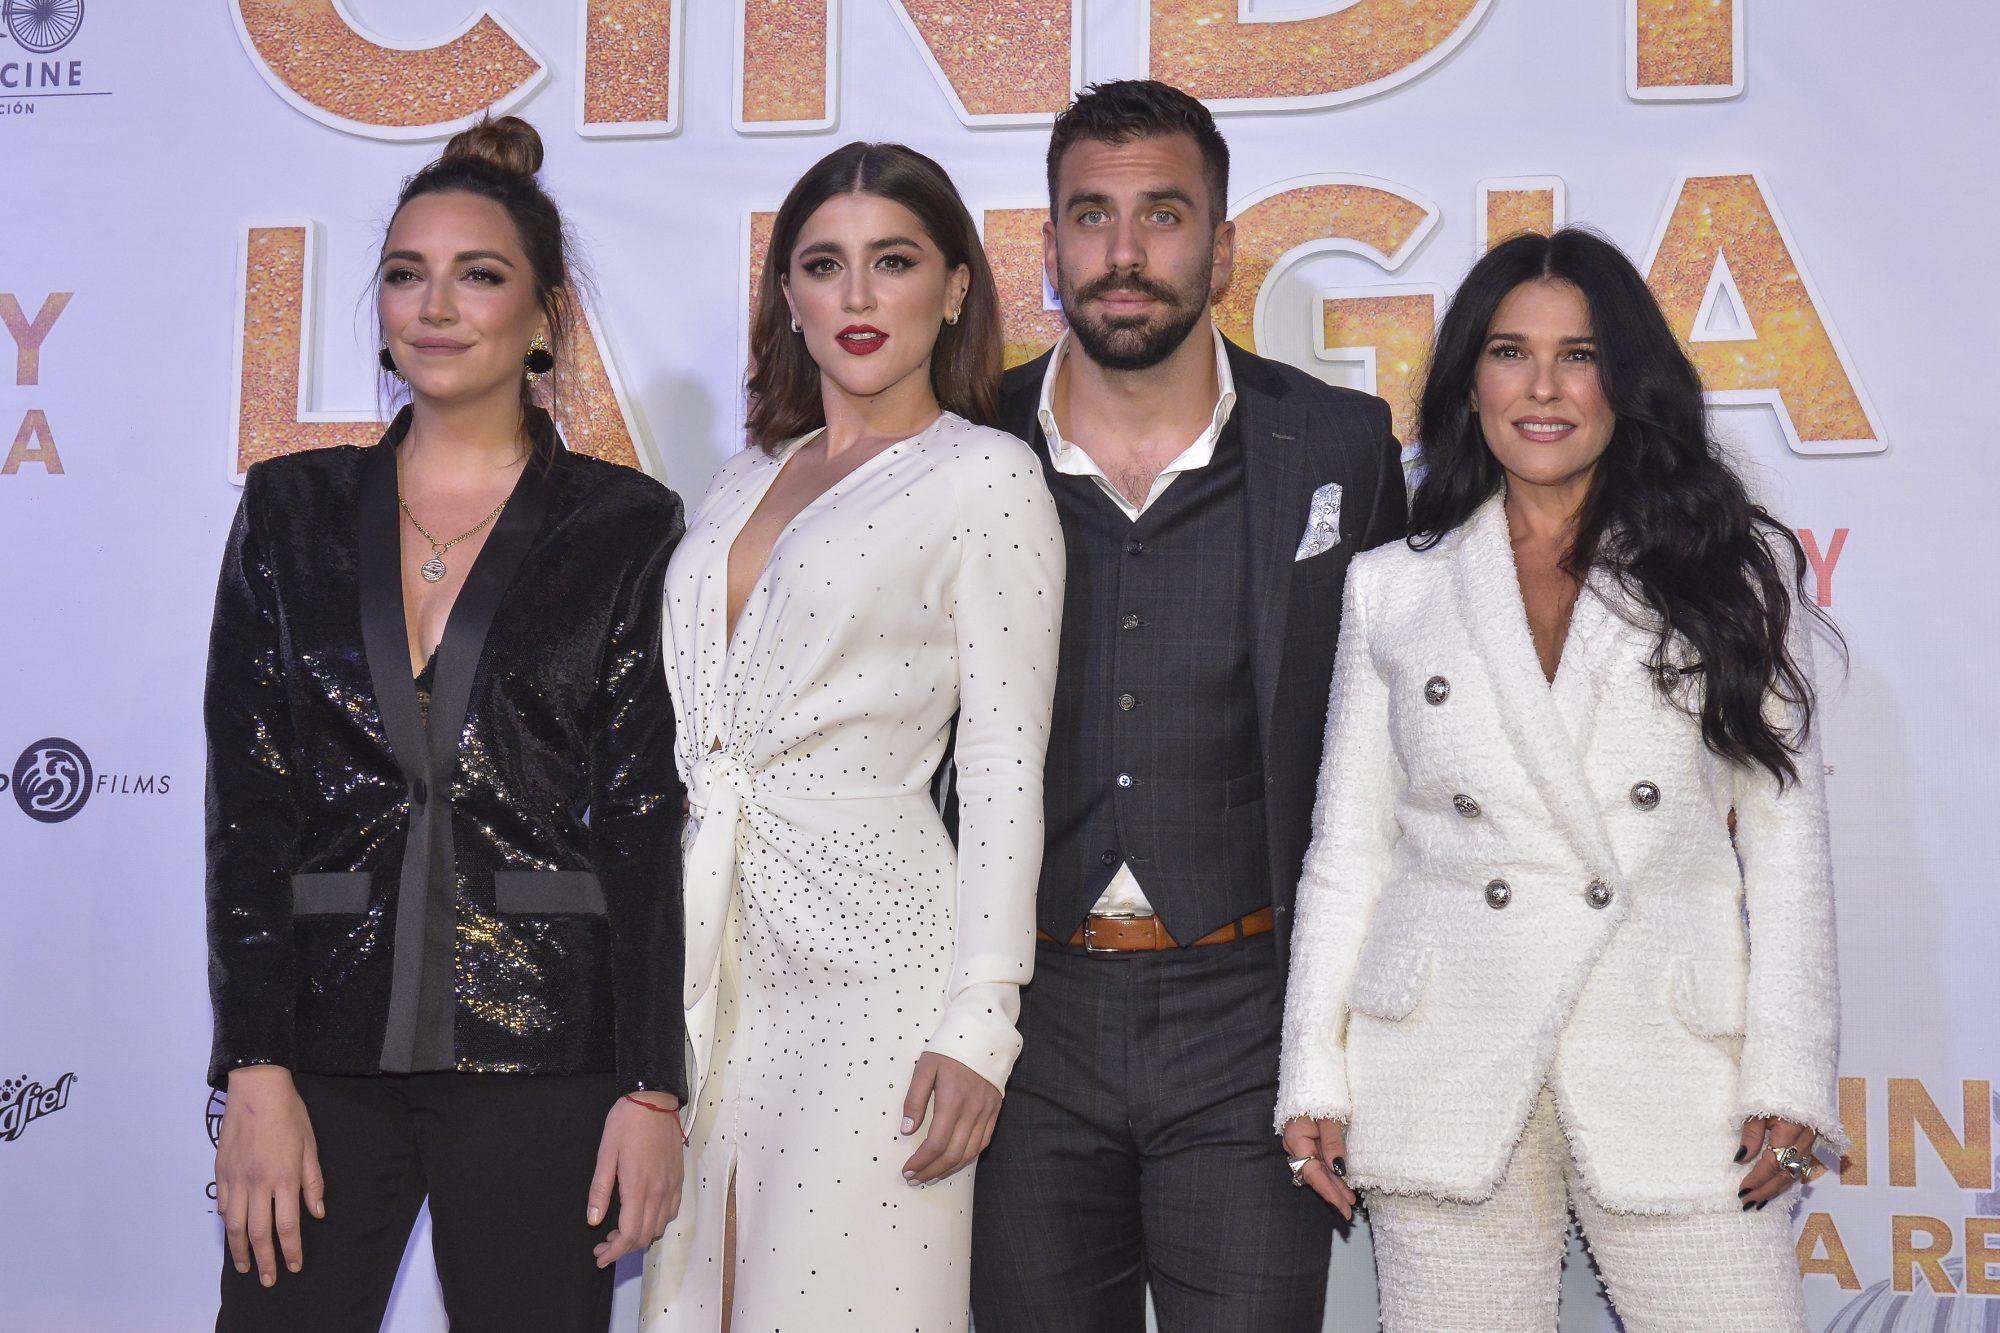 Regina Blandon, Cassandra Sanchez Navarro, Giuseppe Gamba, Martha Debayle, 'Cindy La Regia